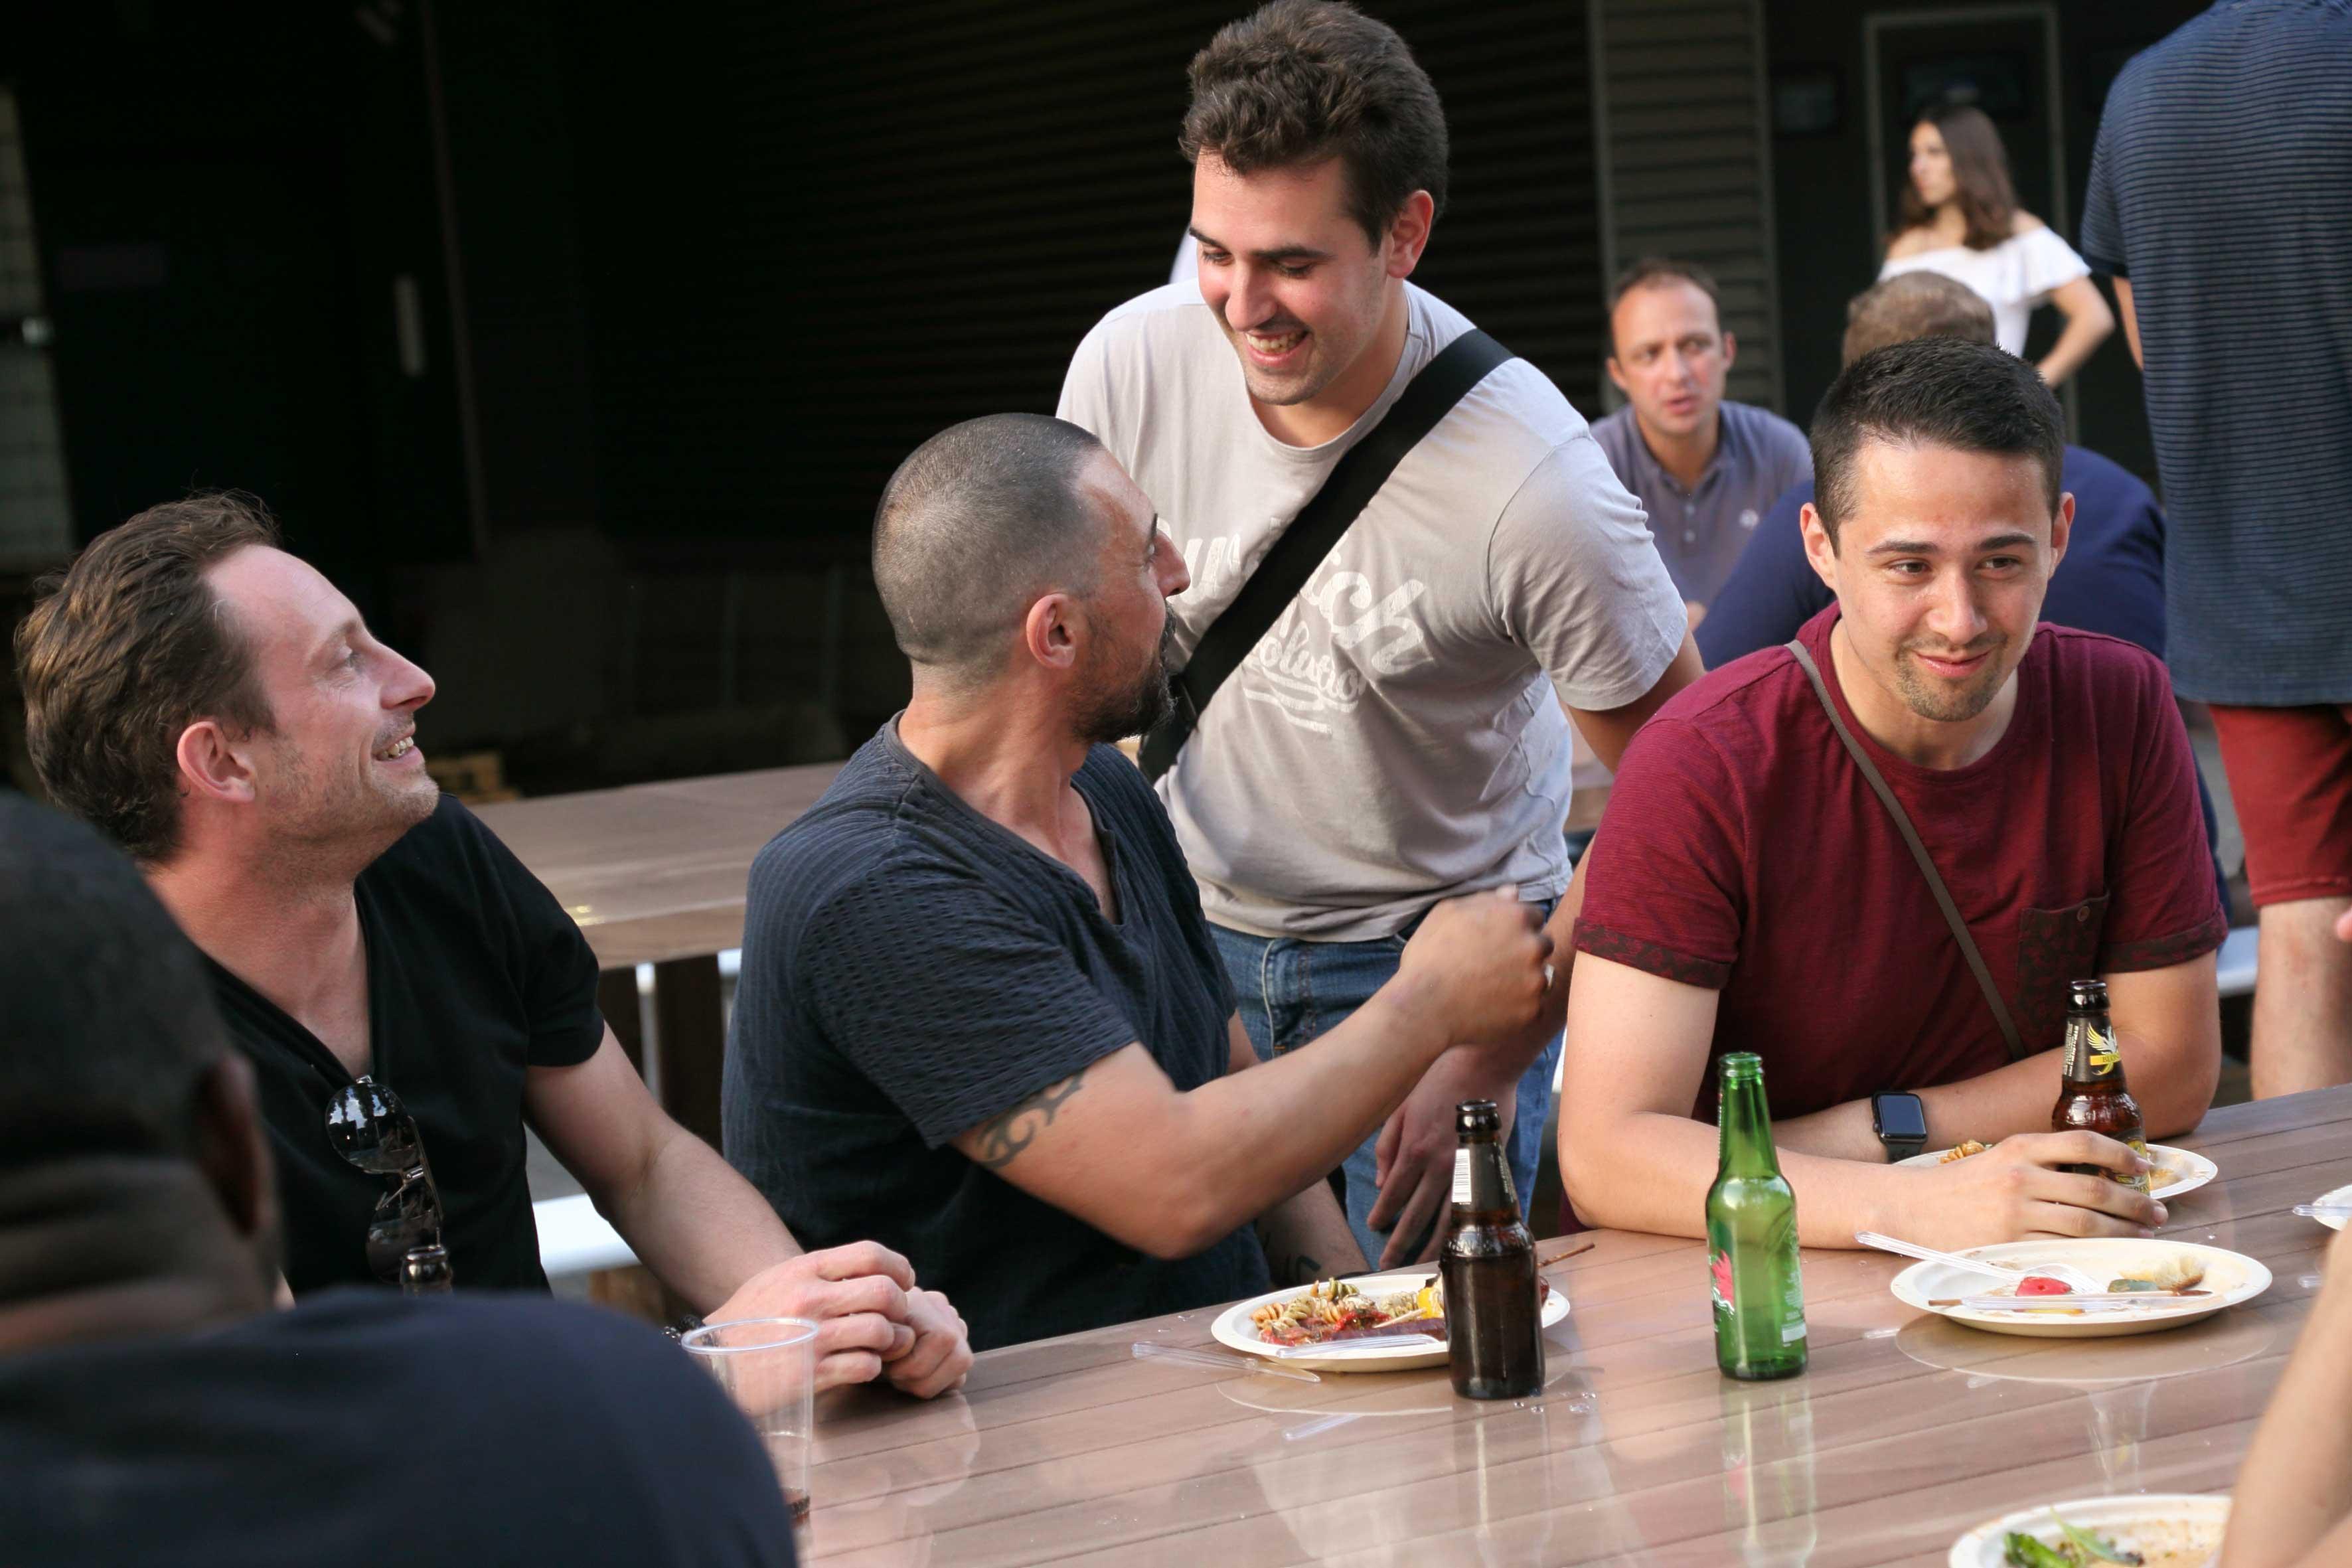 aucop-soiree-wissous-barbecue-29-juin